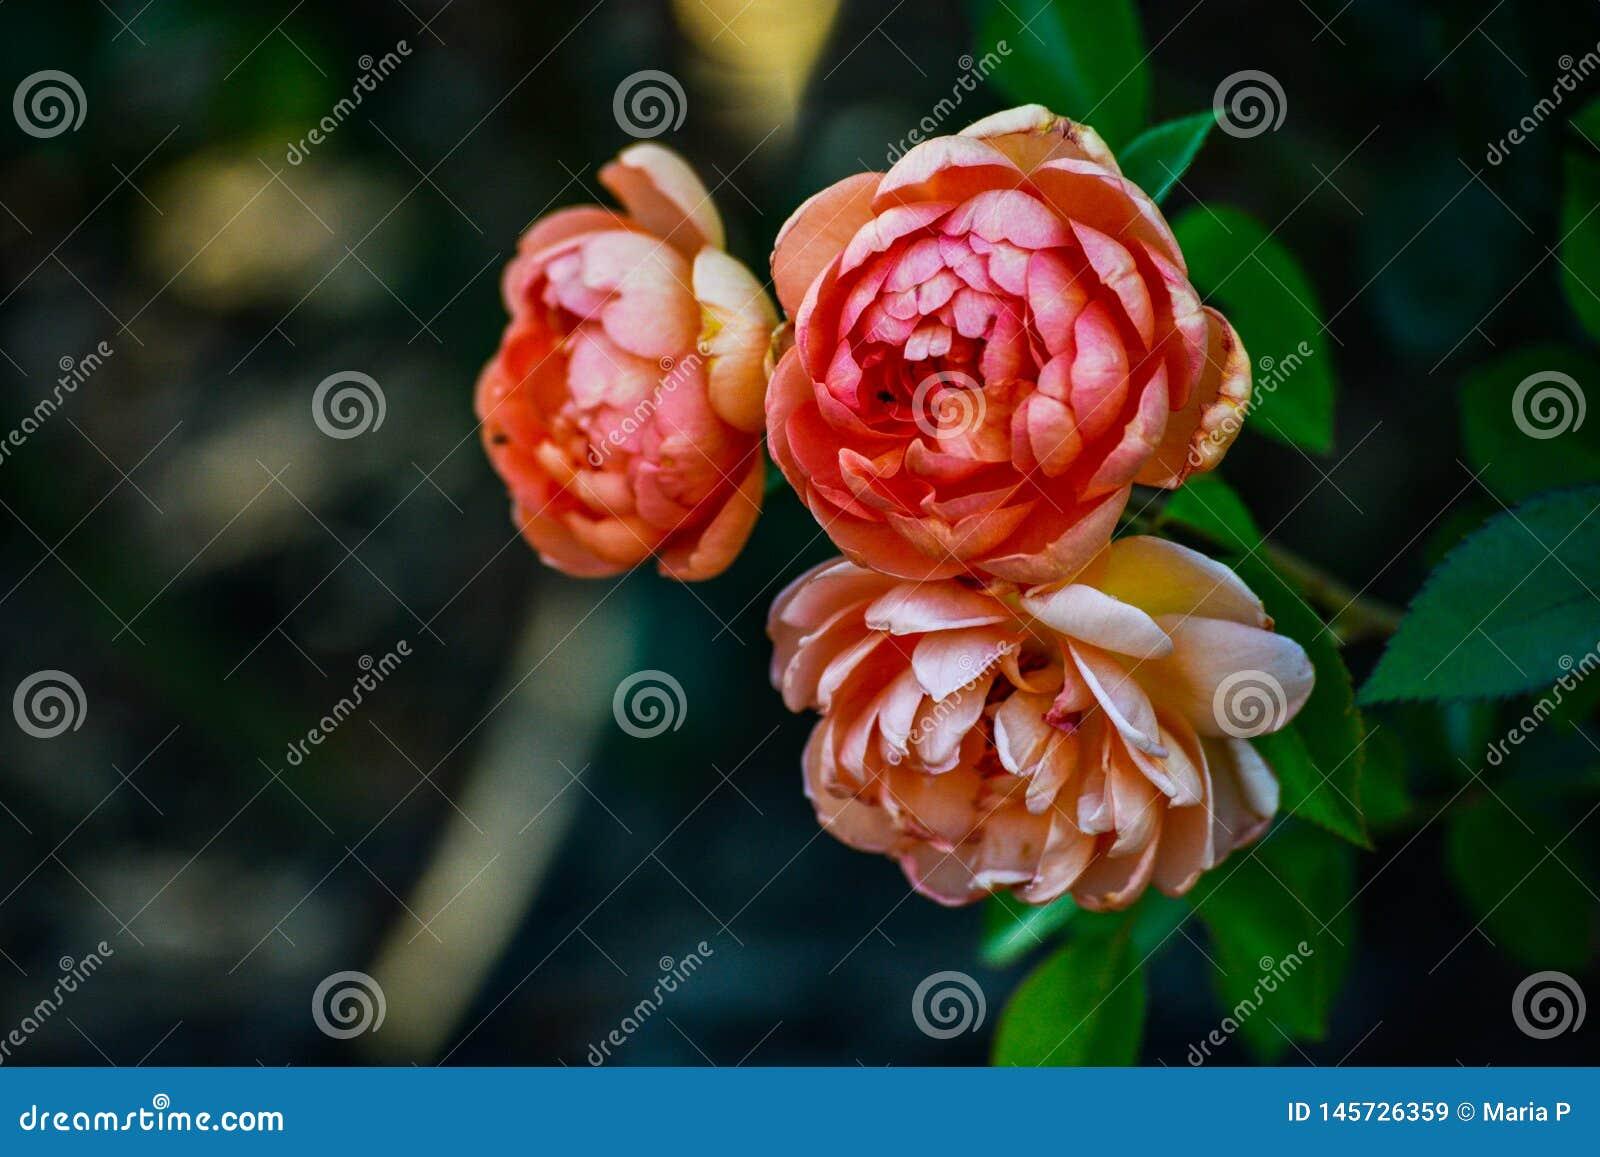 Rose flowers outdoors nature landscape background calm and relaxing park garden natural closeup macro portrait